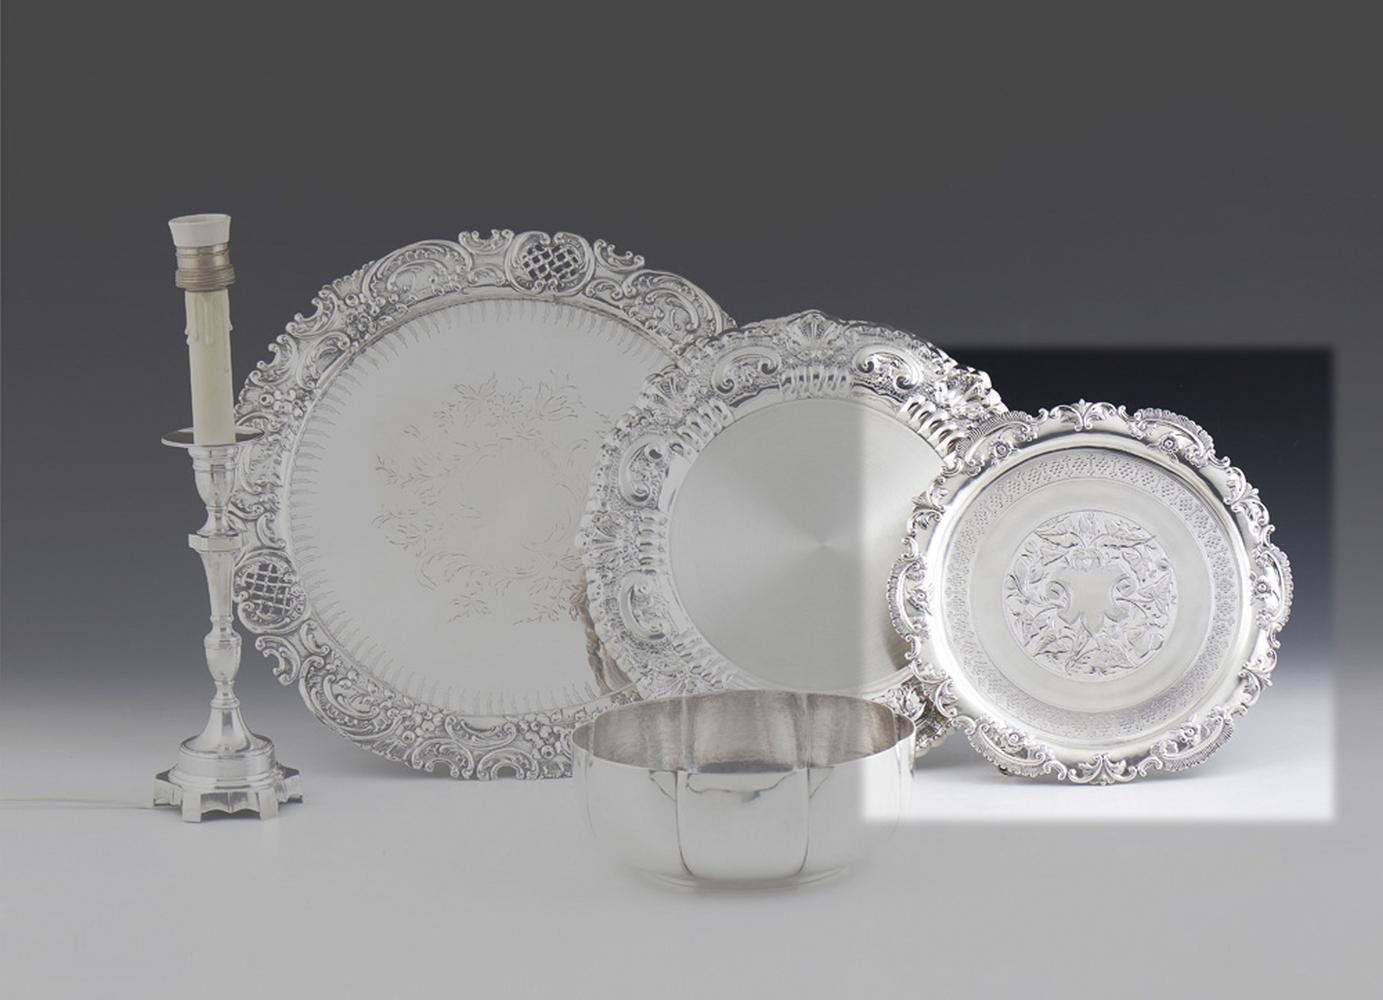 Pequena salva em prata, séc. XIX, P.: 370 g.